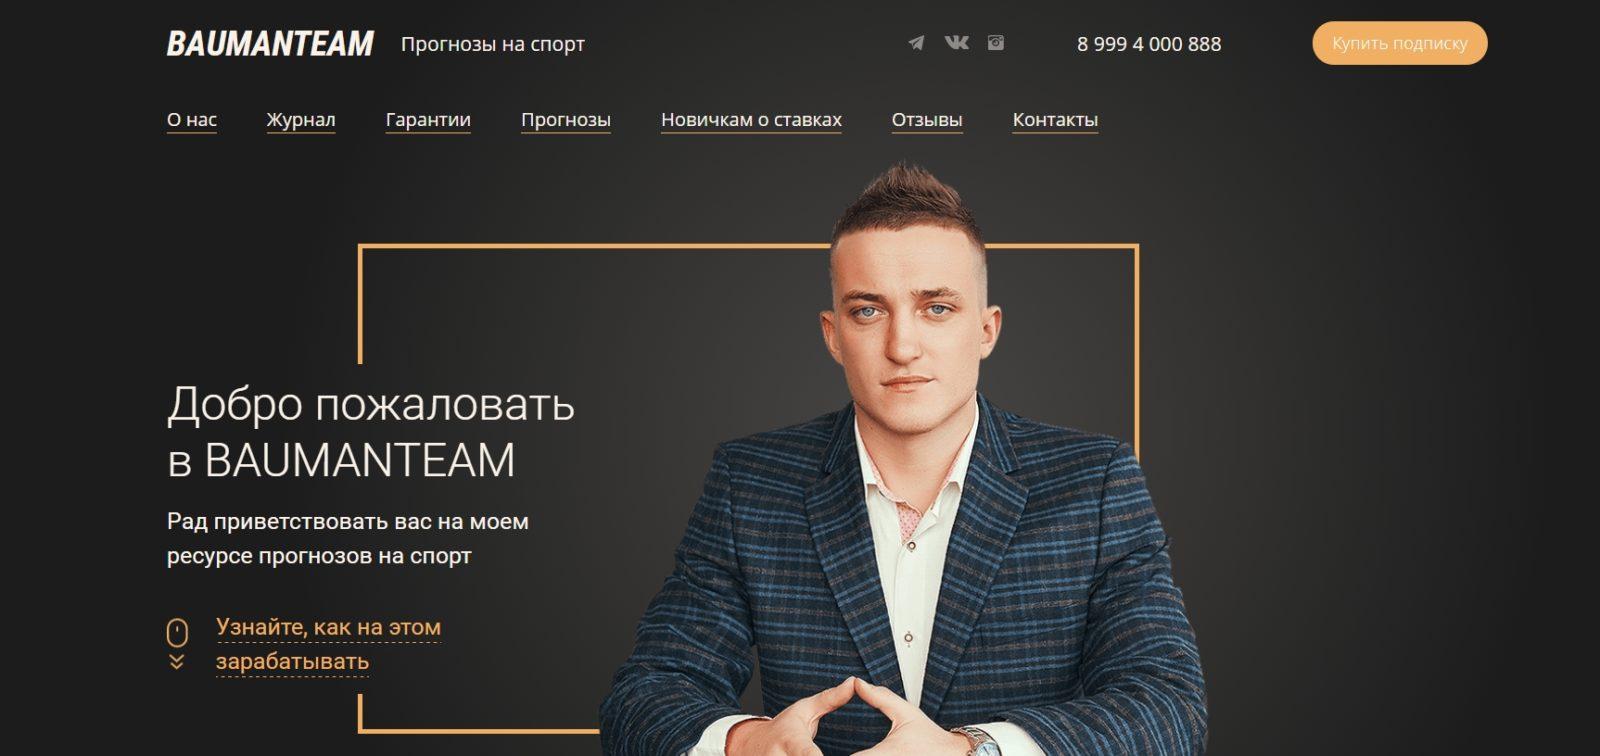 Сайт baumanteam.ru